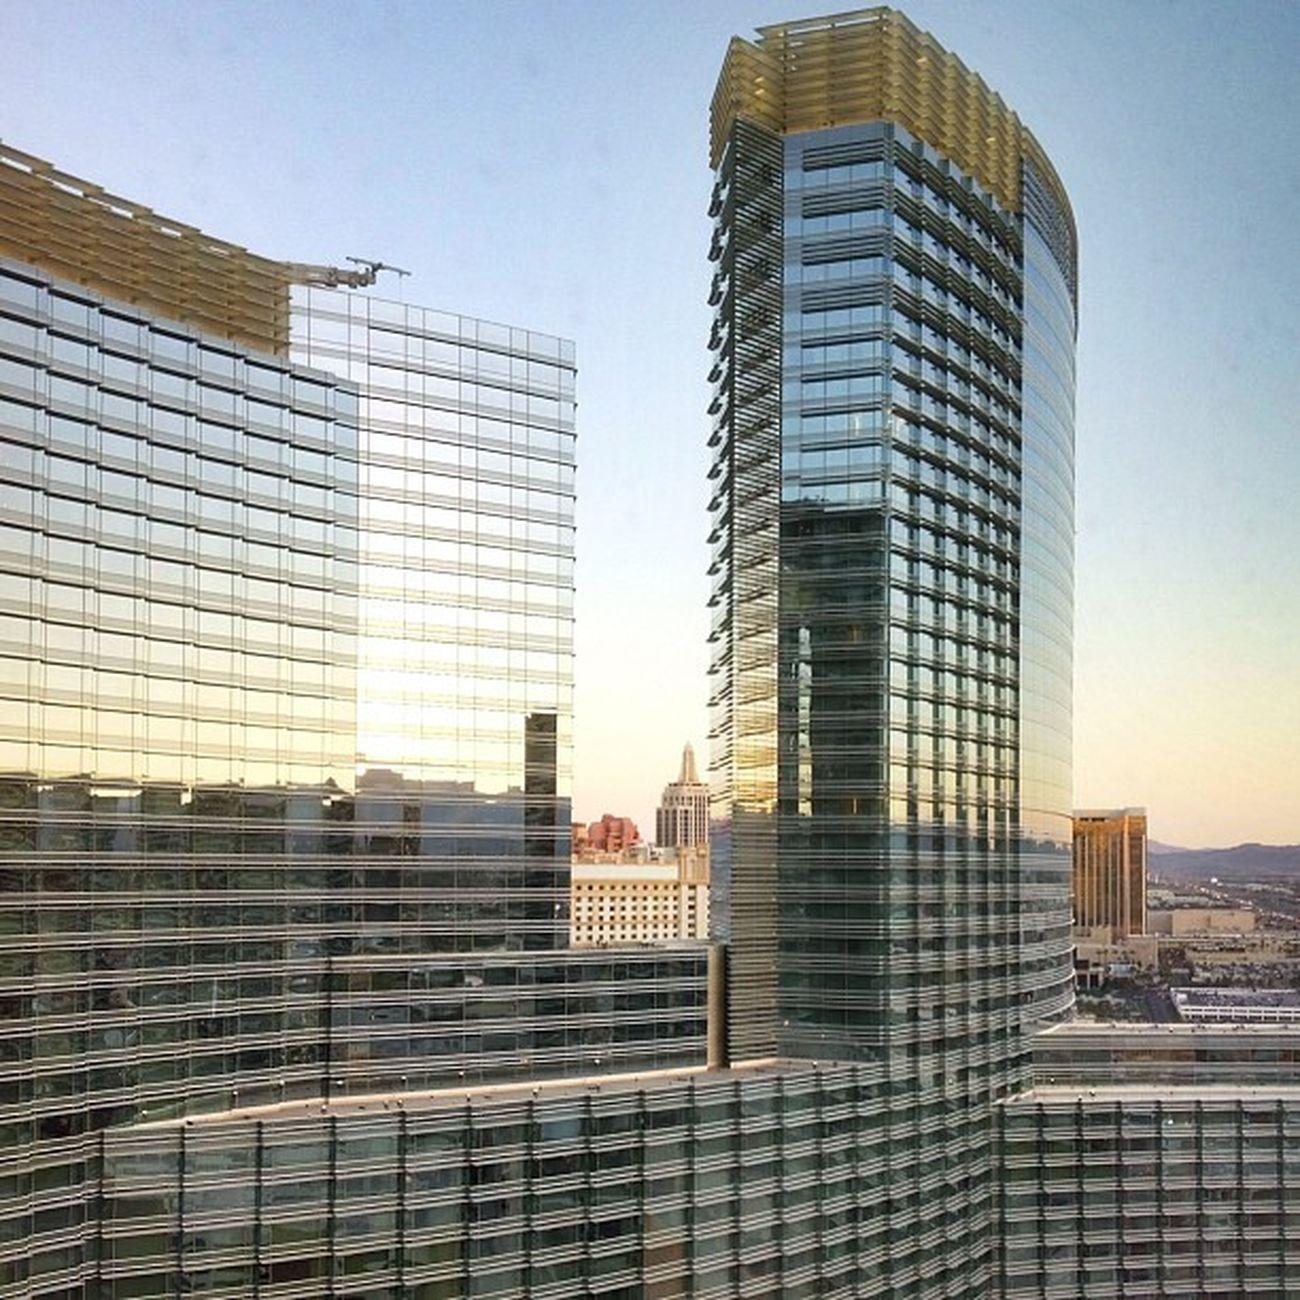 Aria Las Vegas #aria #hotel #lasvegas #nevada #city #house #building #usa #travel #honktravel City Building Travel House Hotel USA Nevada Aria Lasvegas Honktravel